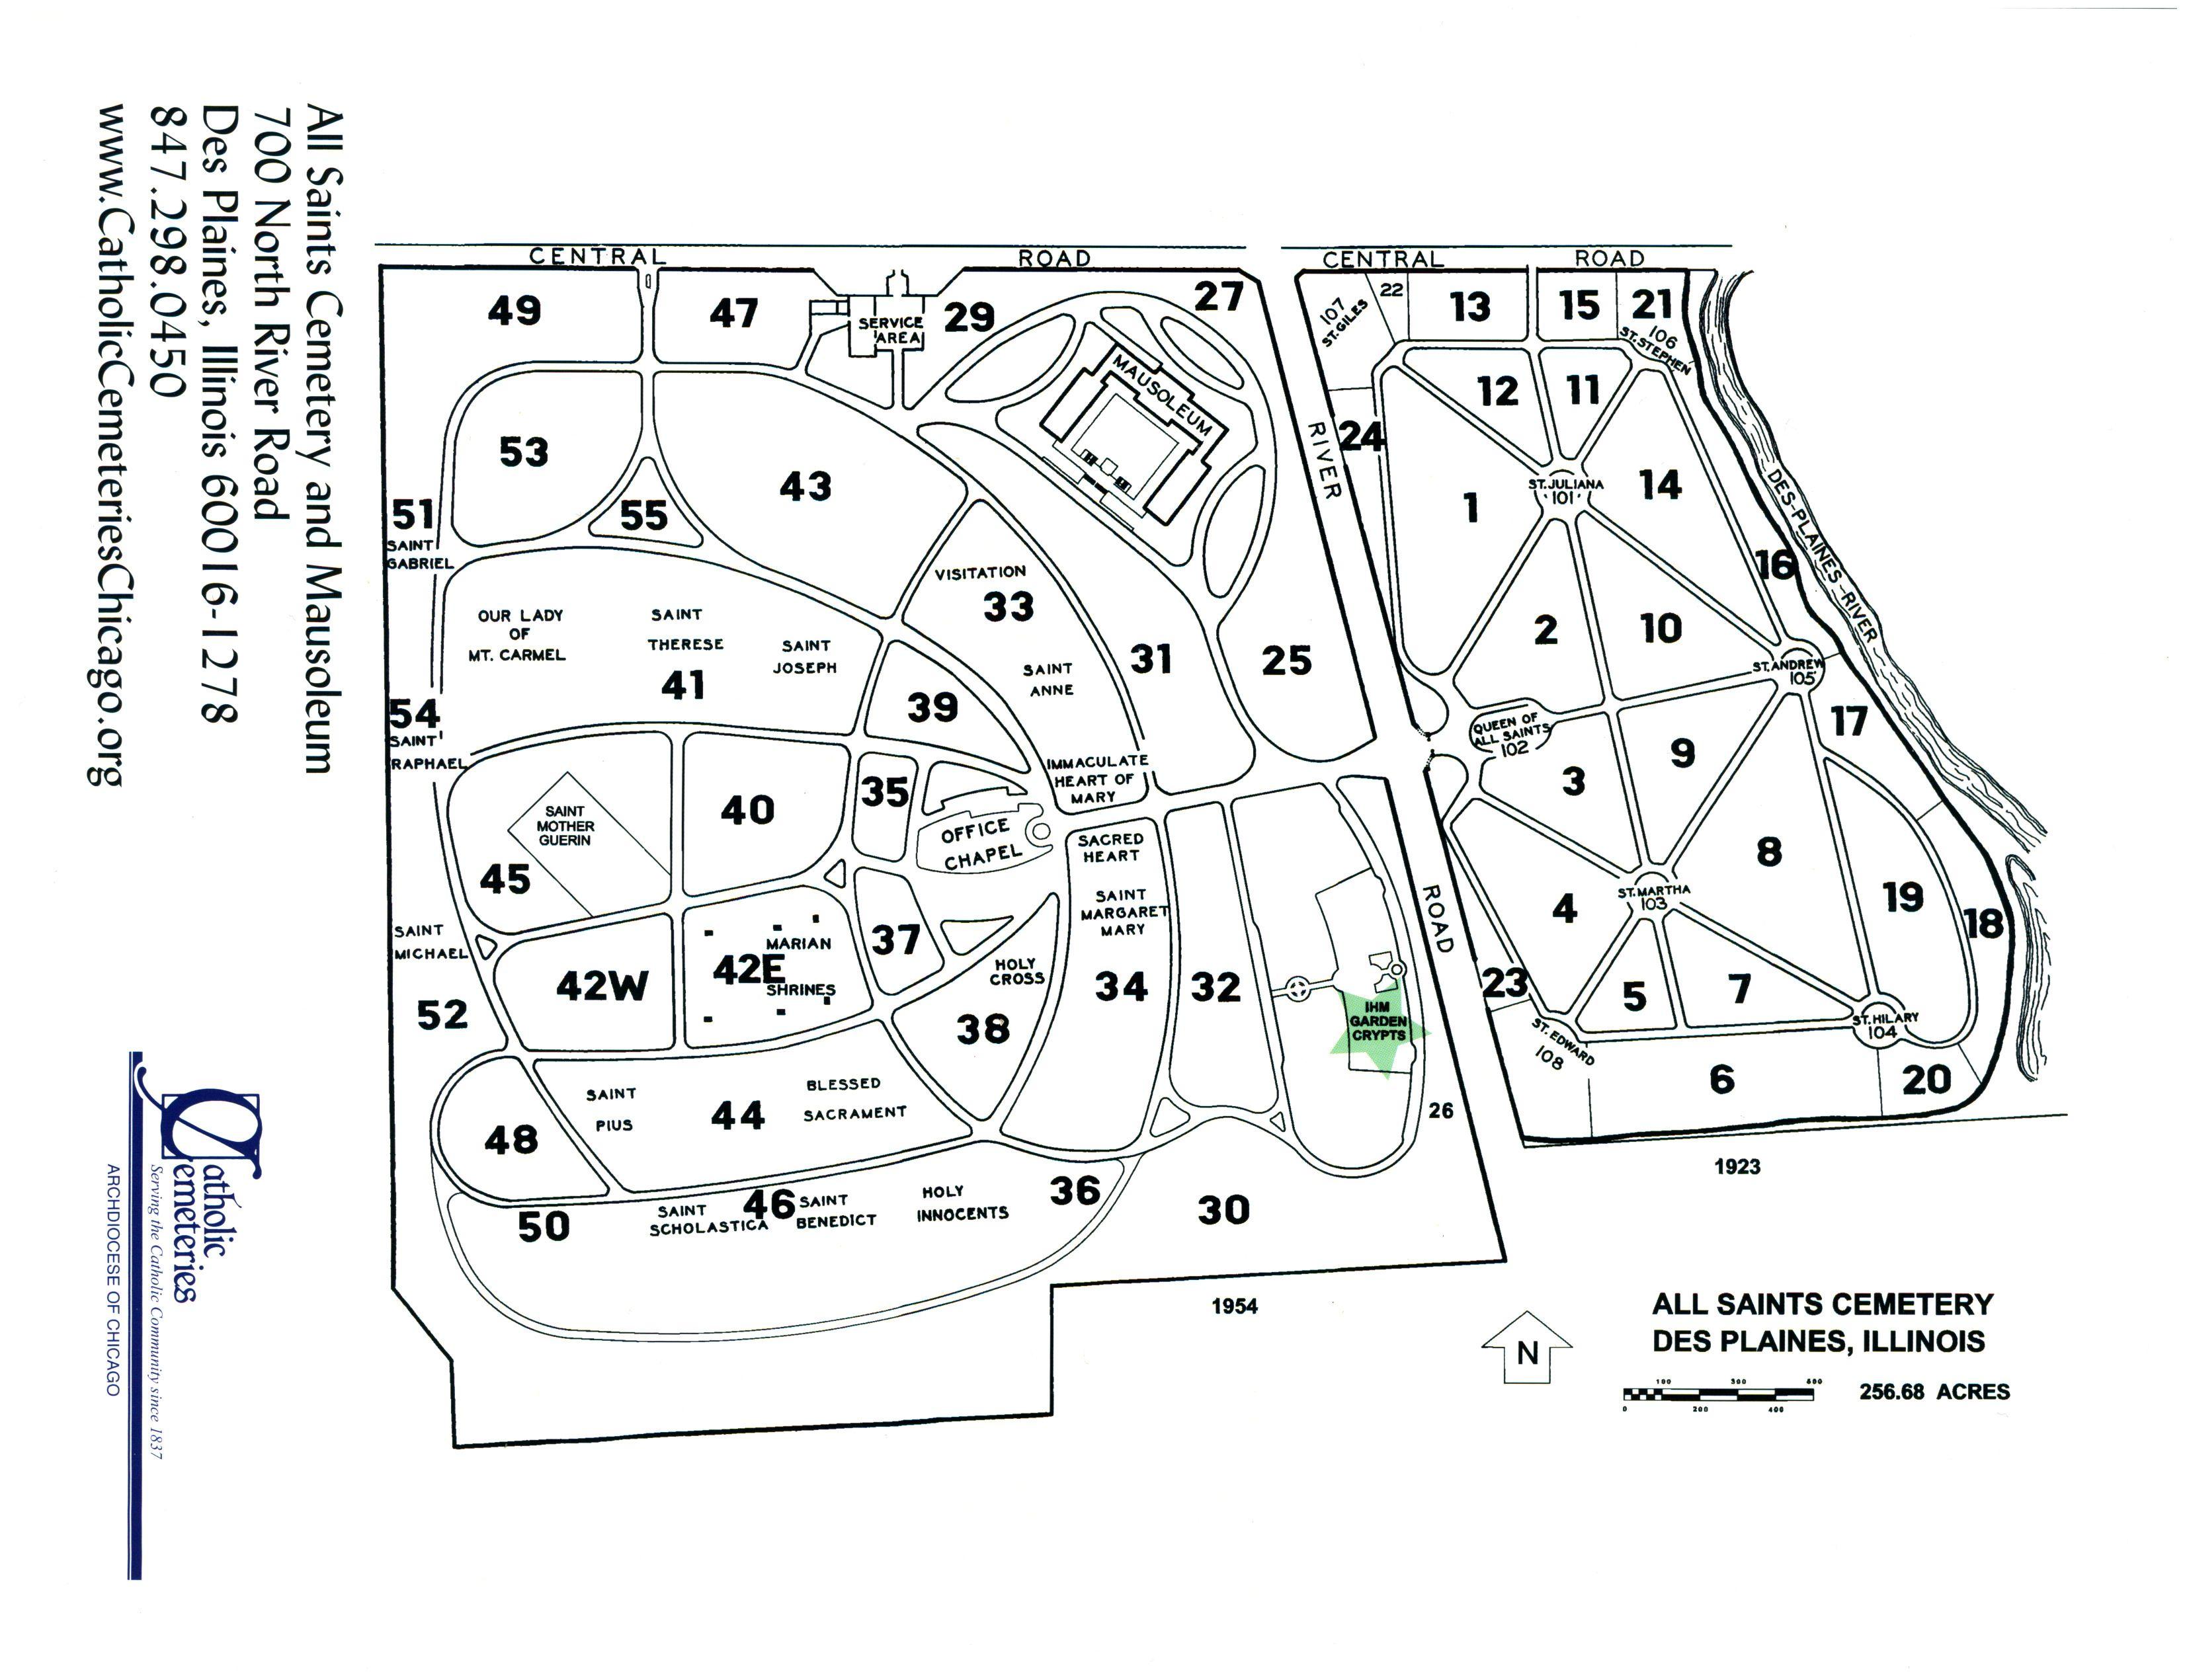 All Saints Catholic Cemetery and Mausoleum in Des Plaines ...